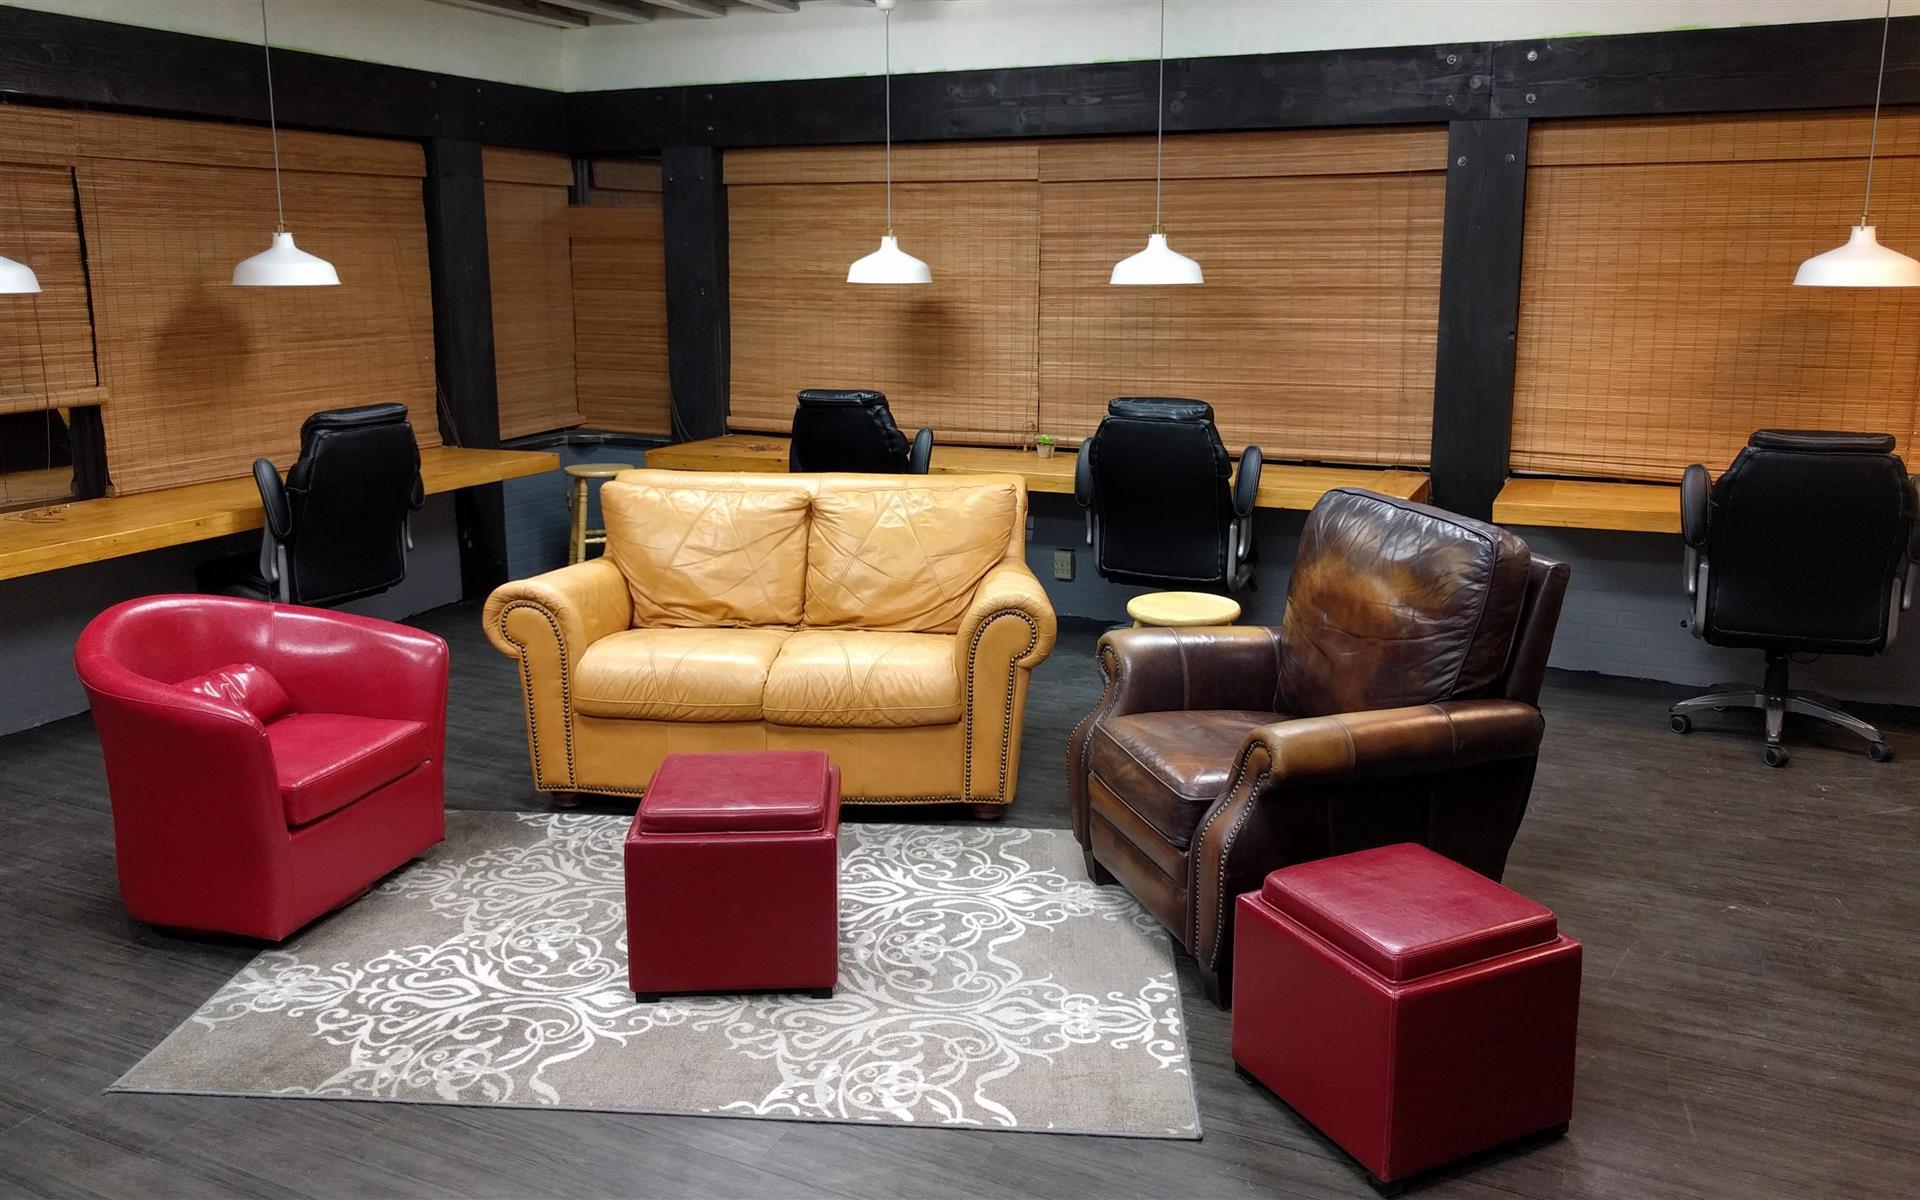 Aurora Meeting Space (Entire Unit & Free Parking) - Aurora Meeting Space, Entire Unit 650ft2